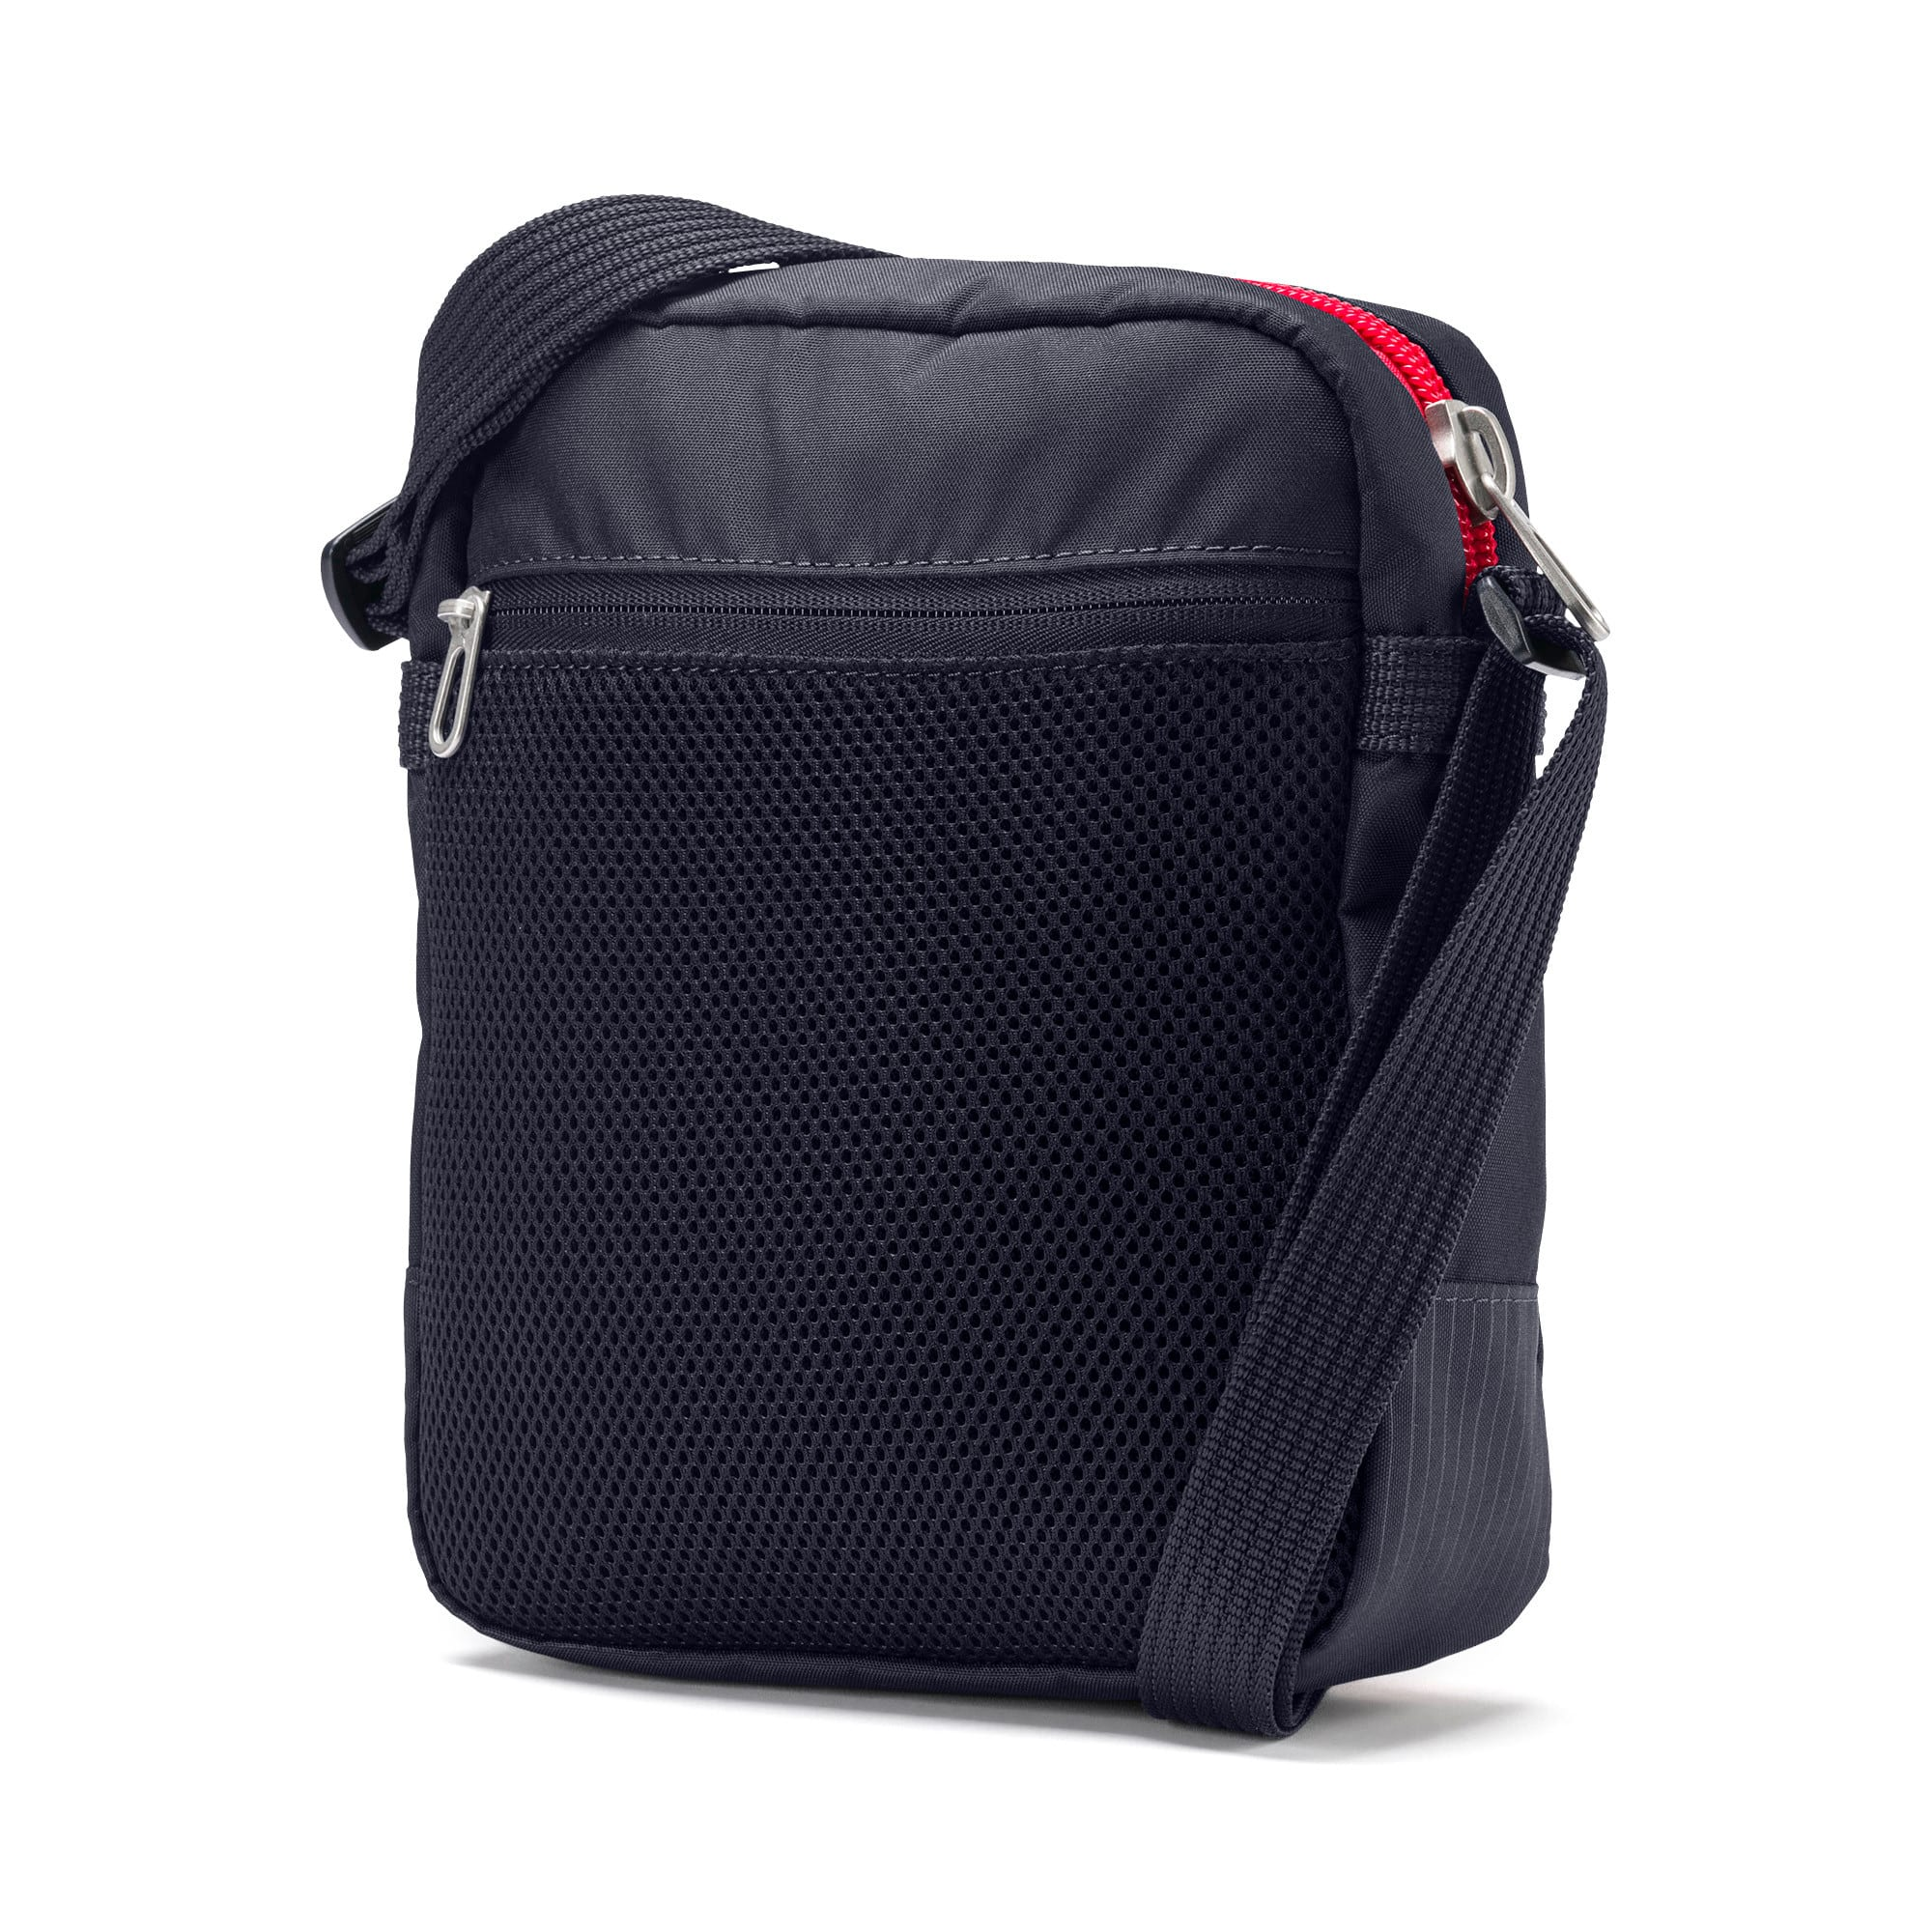 Thumbnail 2 of AM Red Bull Racing Replica Portable Bag, NIGHT SKY, medium